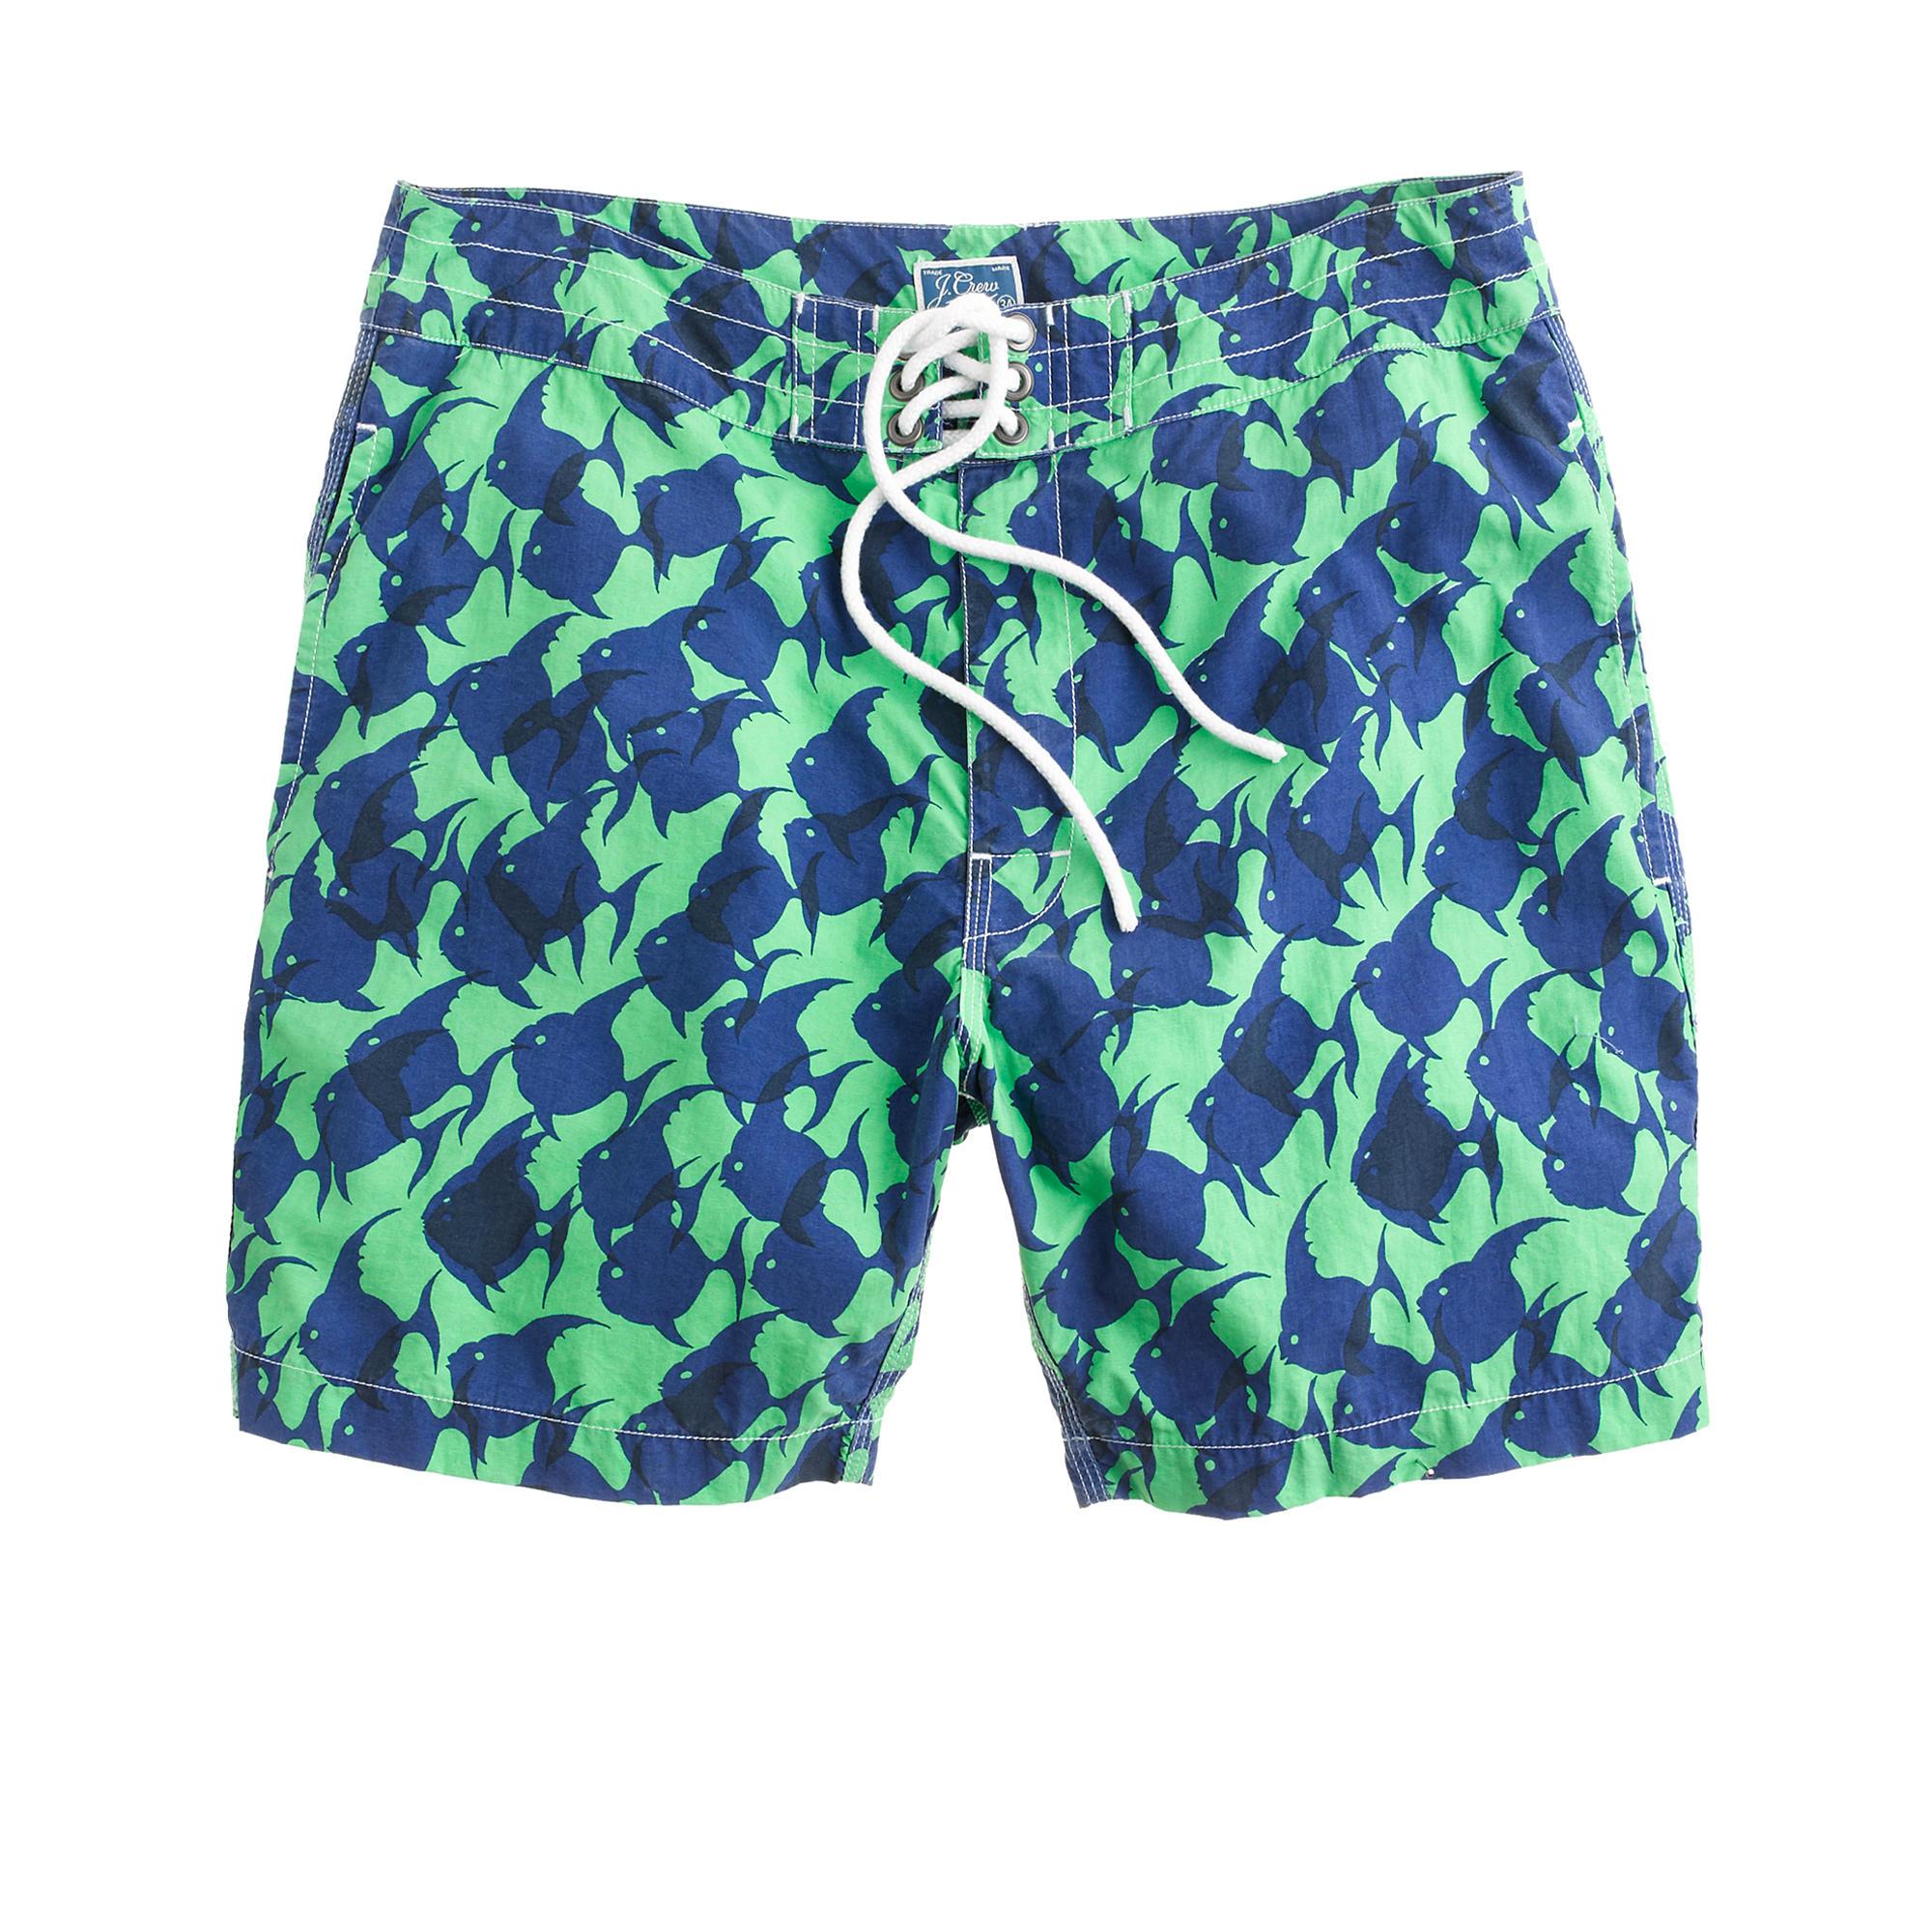 7 board shorts in tropical fish j crew for Fishing swim trunks